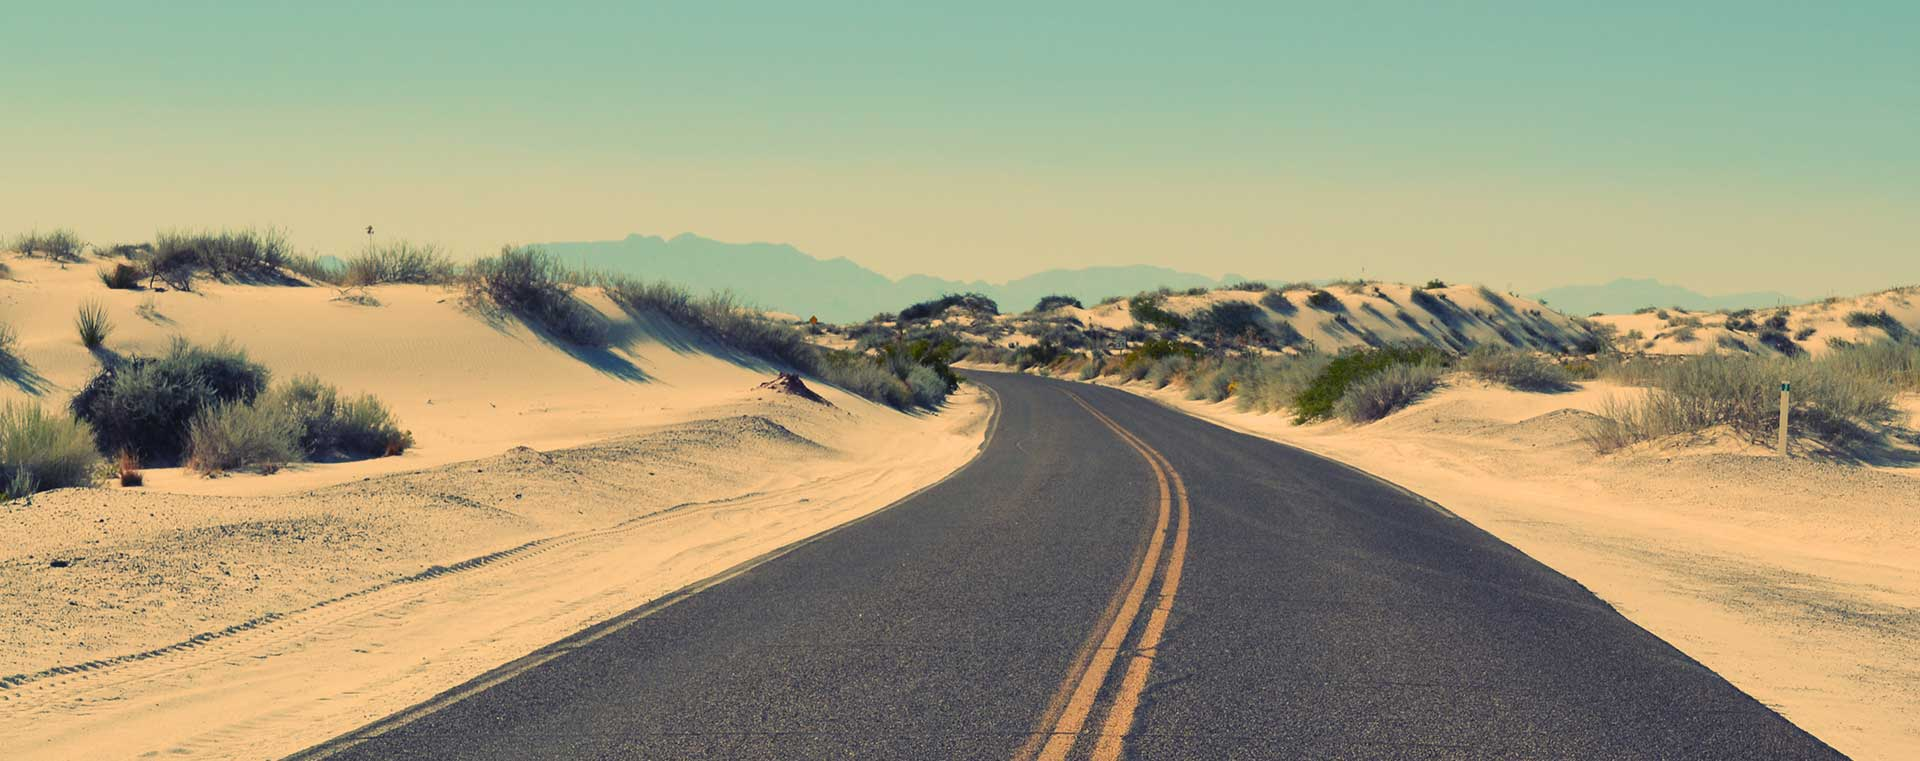 road-sand-dunes-blue-sky